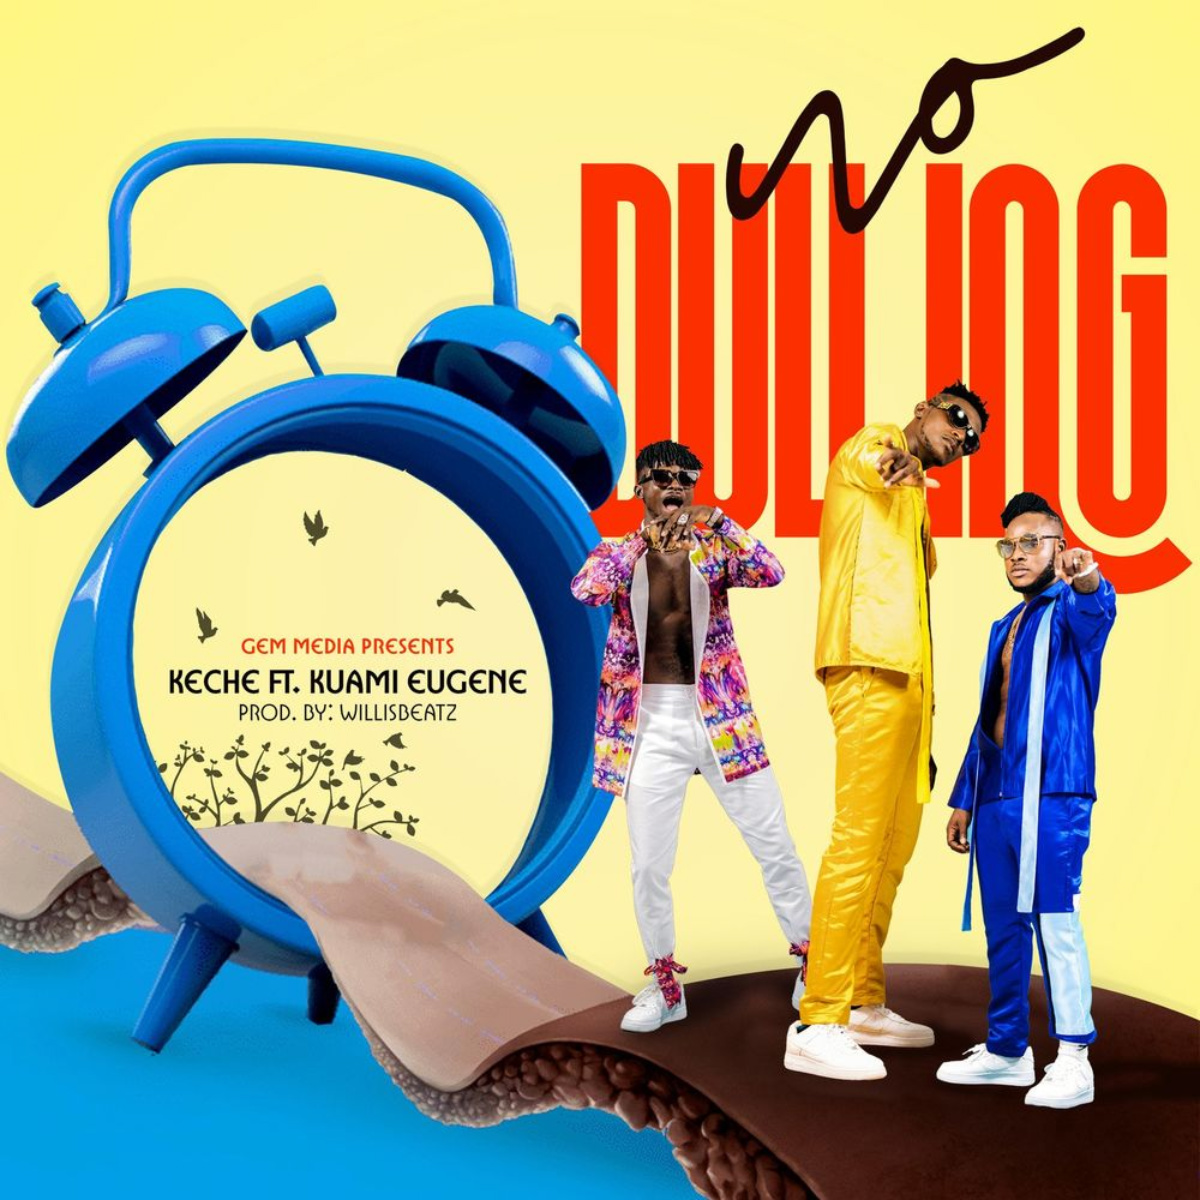 No Dulling by Keche feat. Kuami Eugene